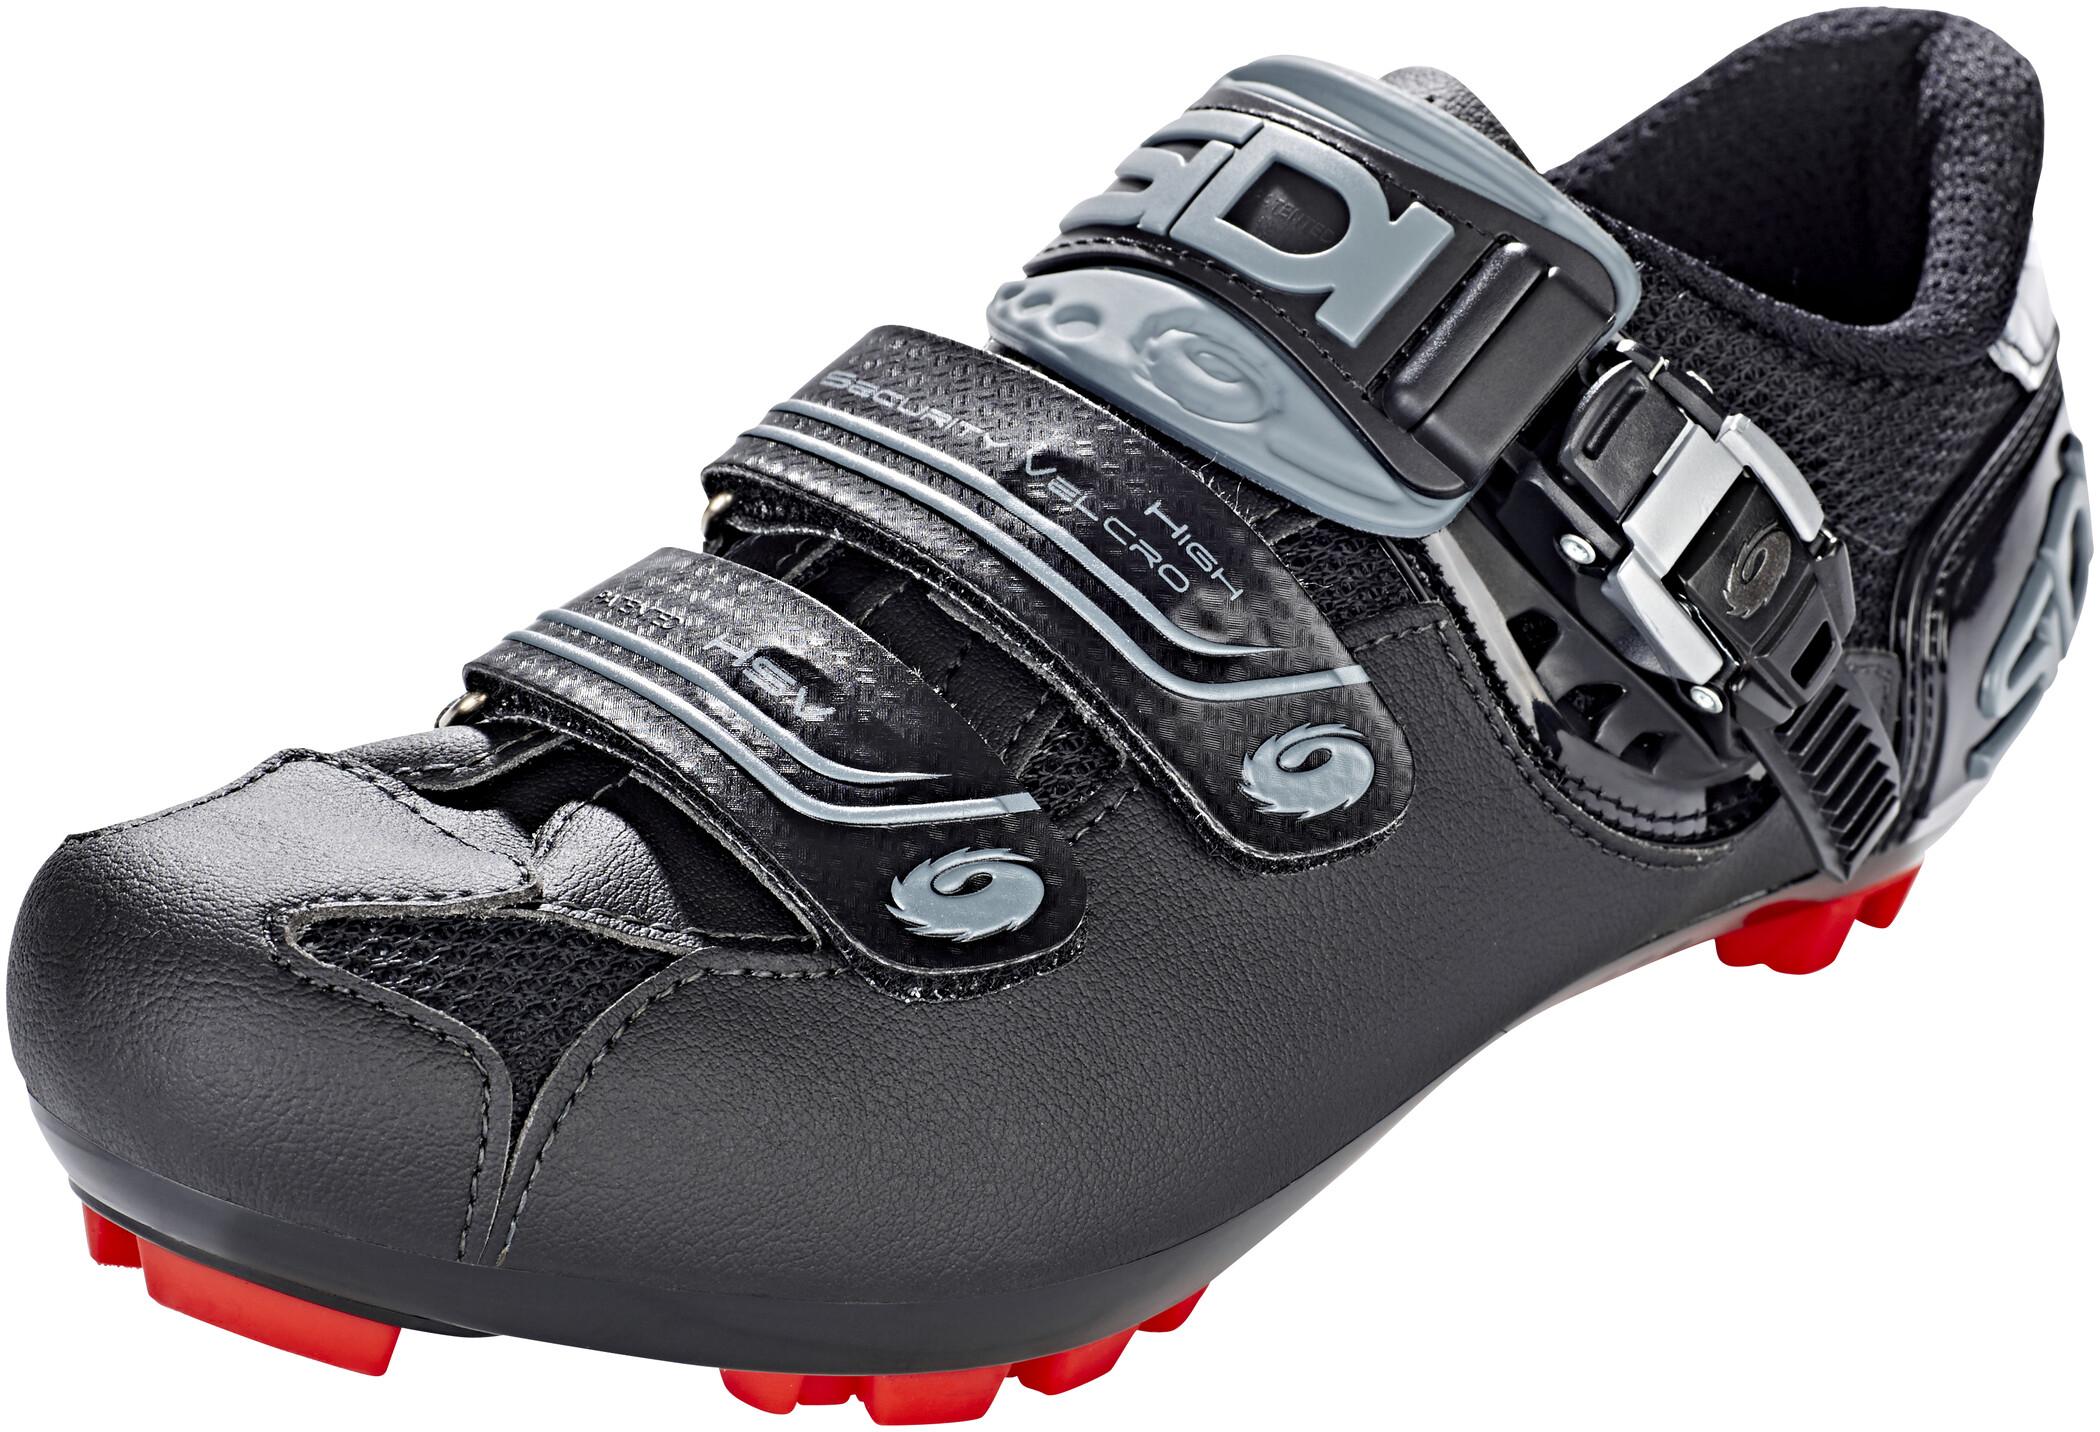 Sidi MTB Eagle 7-SR Sko Herrer, shadow black (2019)   Shoes and overlays